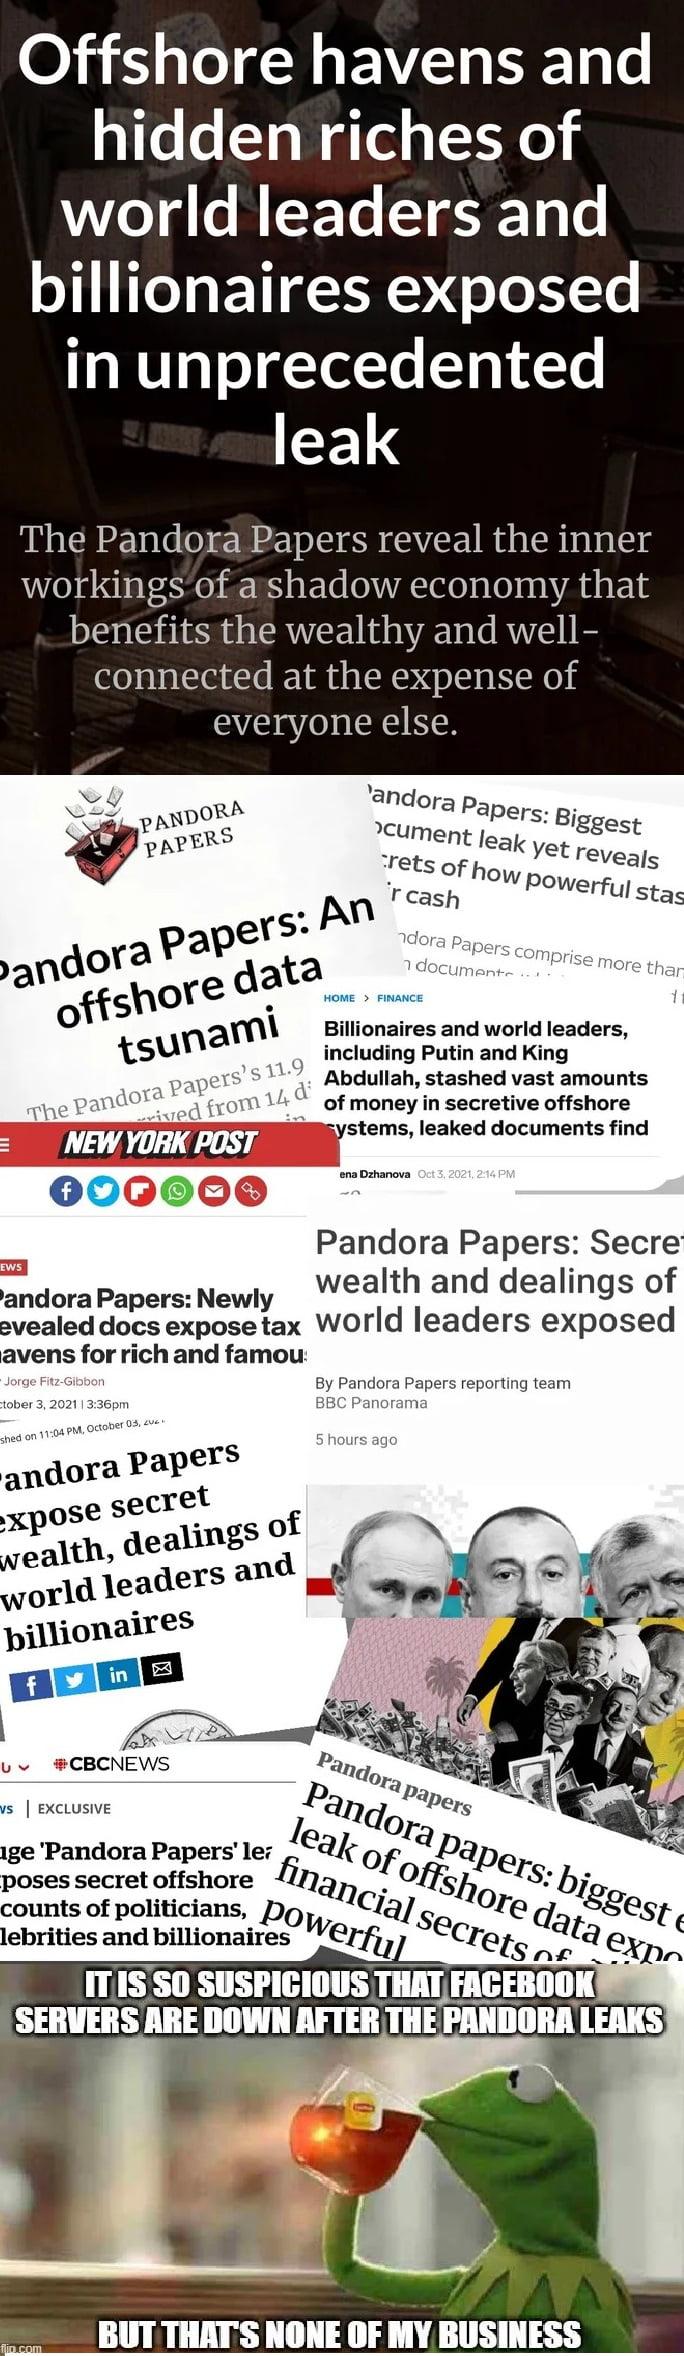 Pandora leak coincidence